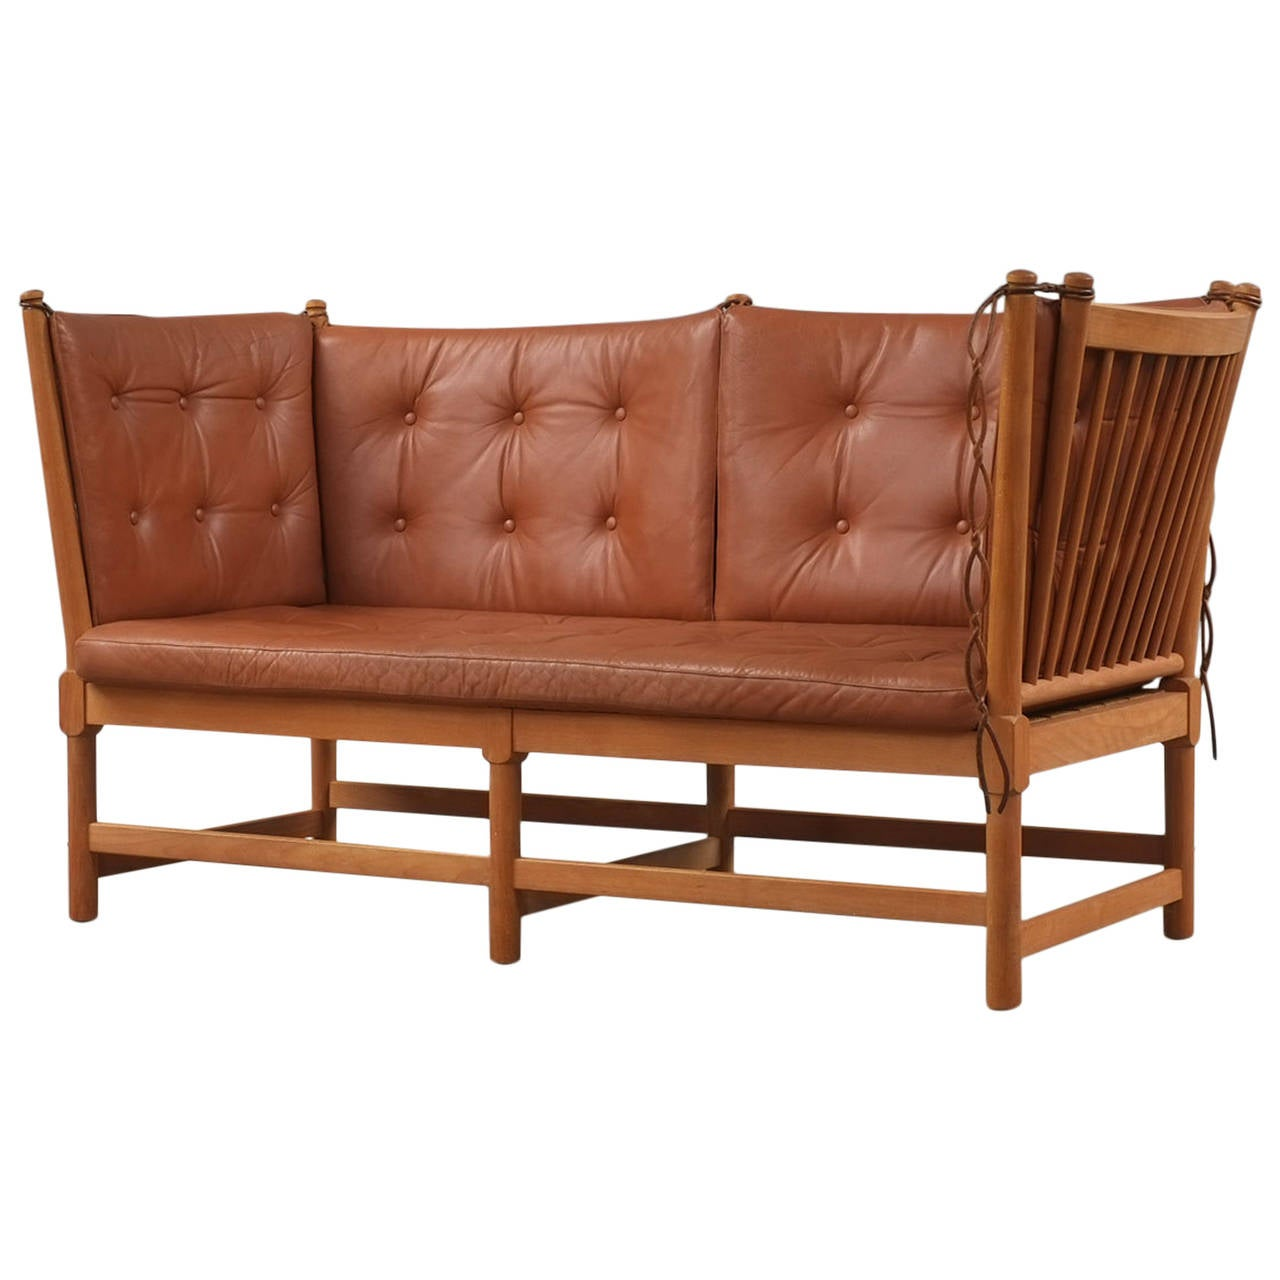 Børge Mogensen Spokeback Sofa For